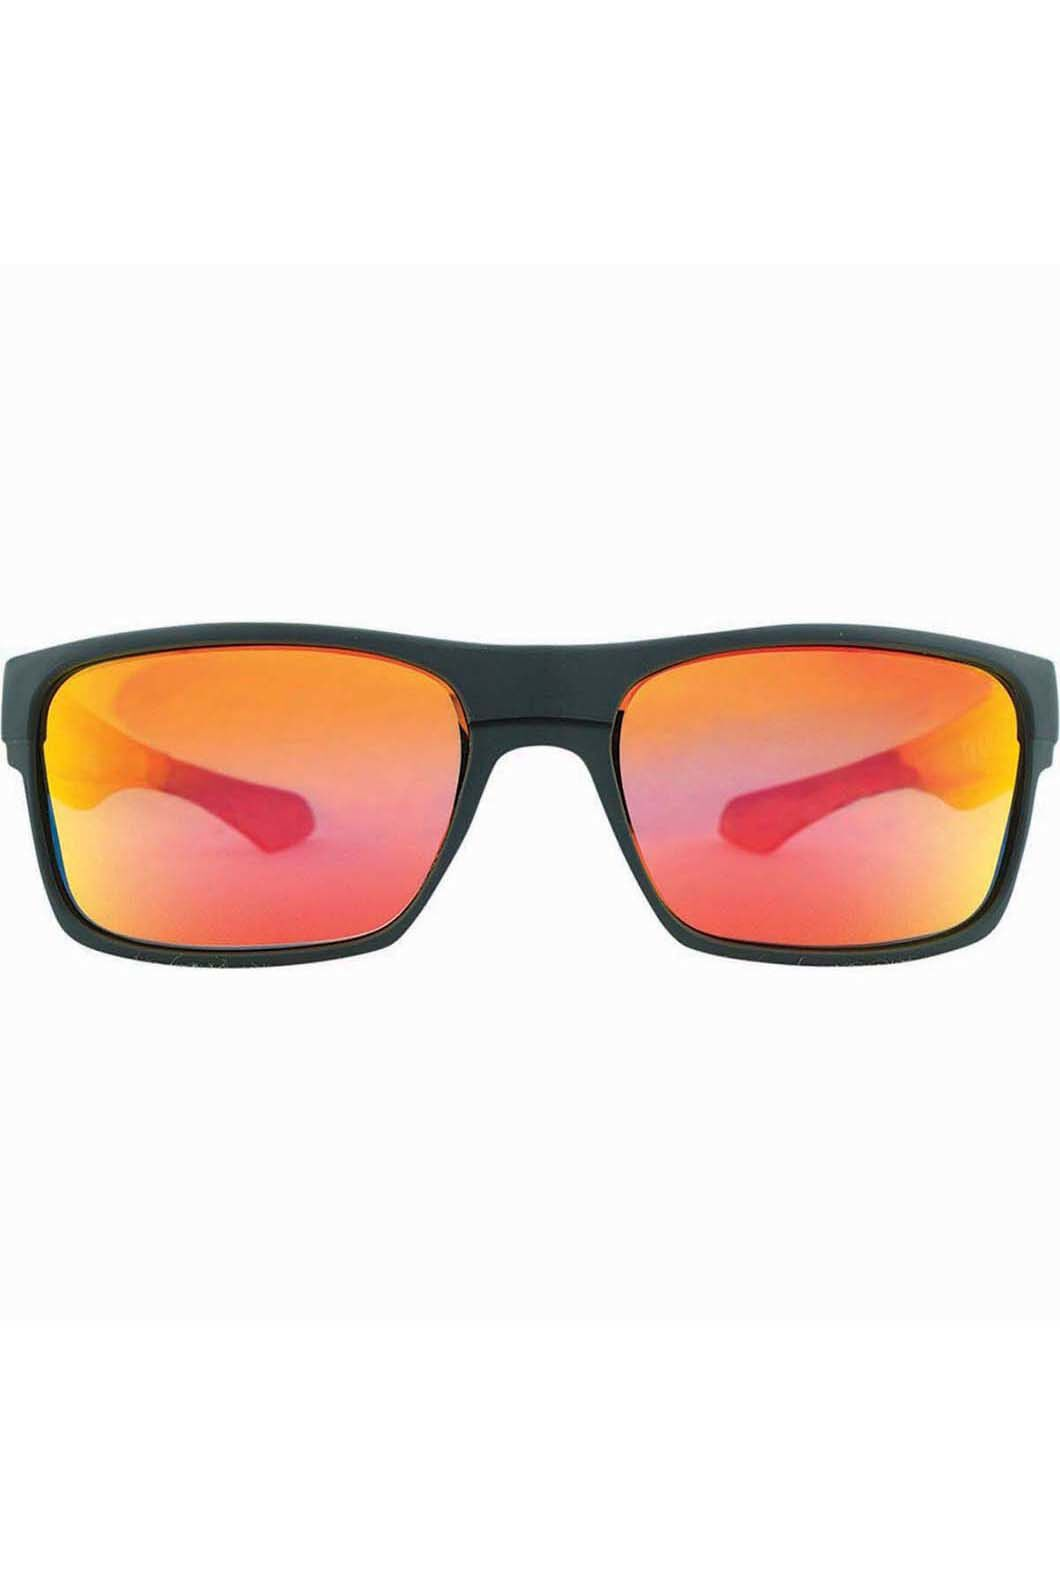 Venture Eyewear Men's Trail Sunglasses, RED/BLACK, hi-res